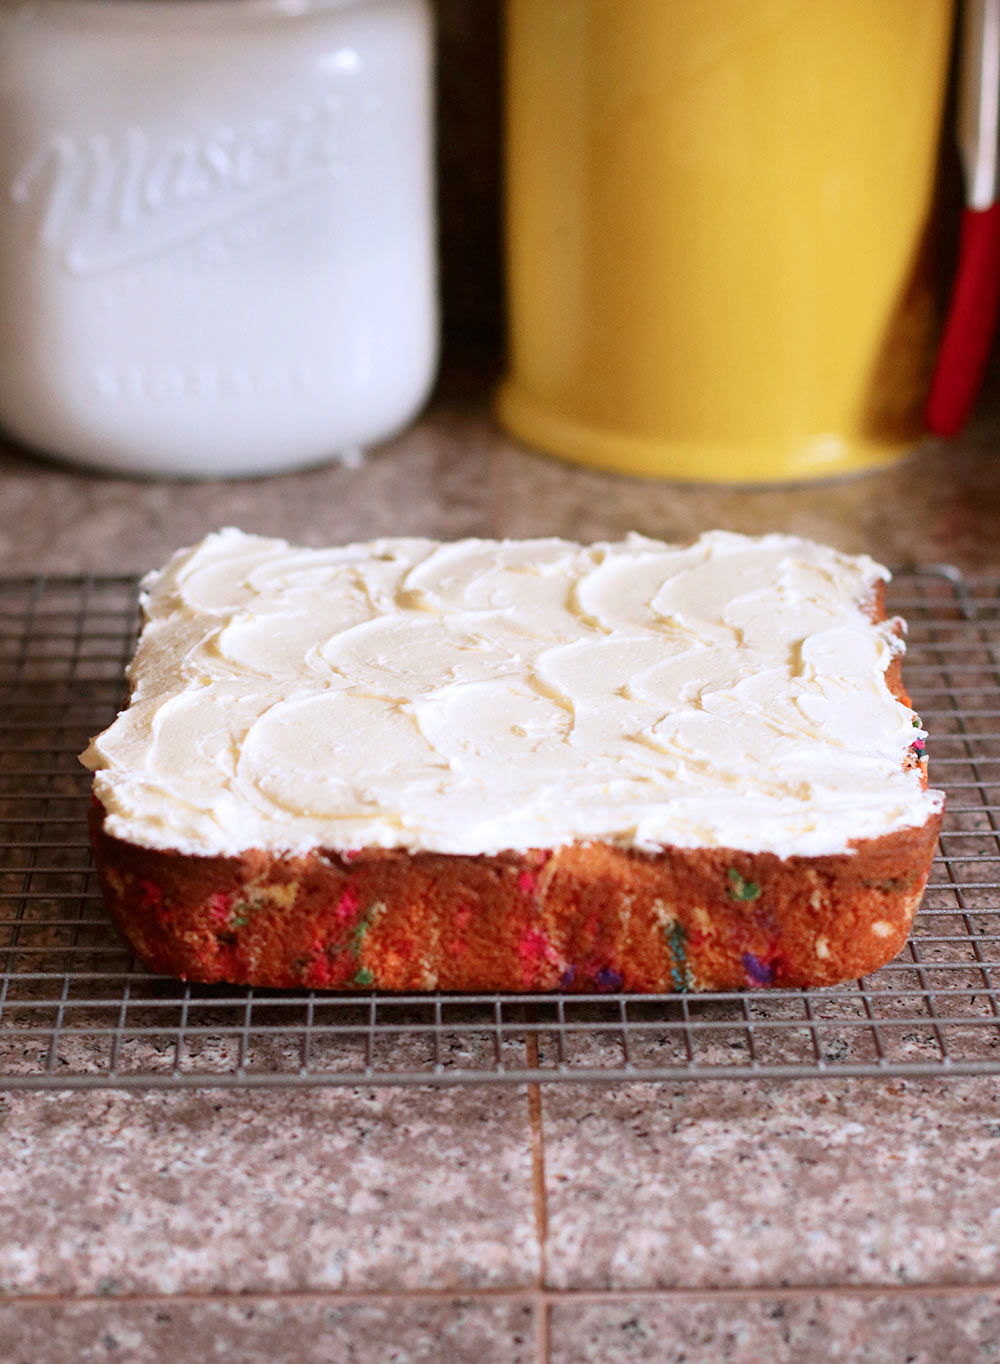 baked sprinkle cake final